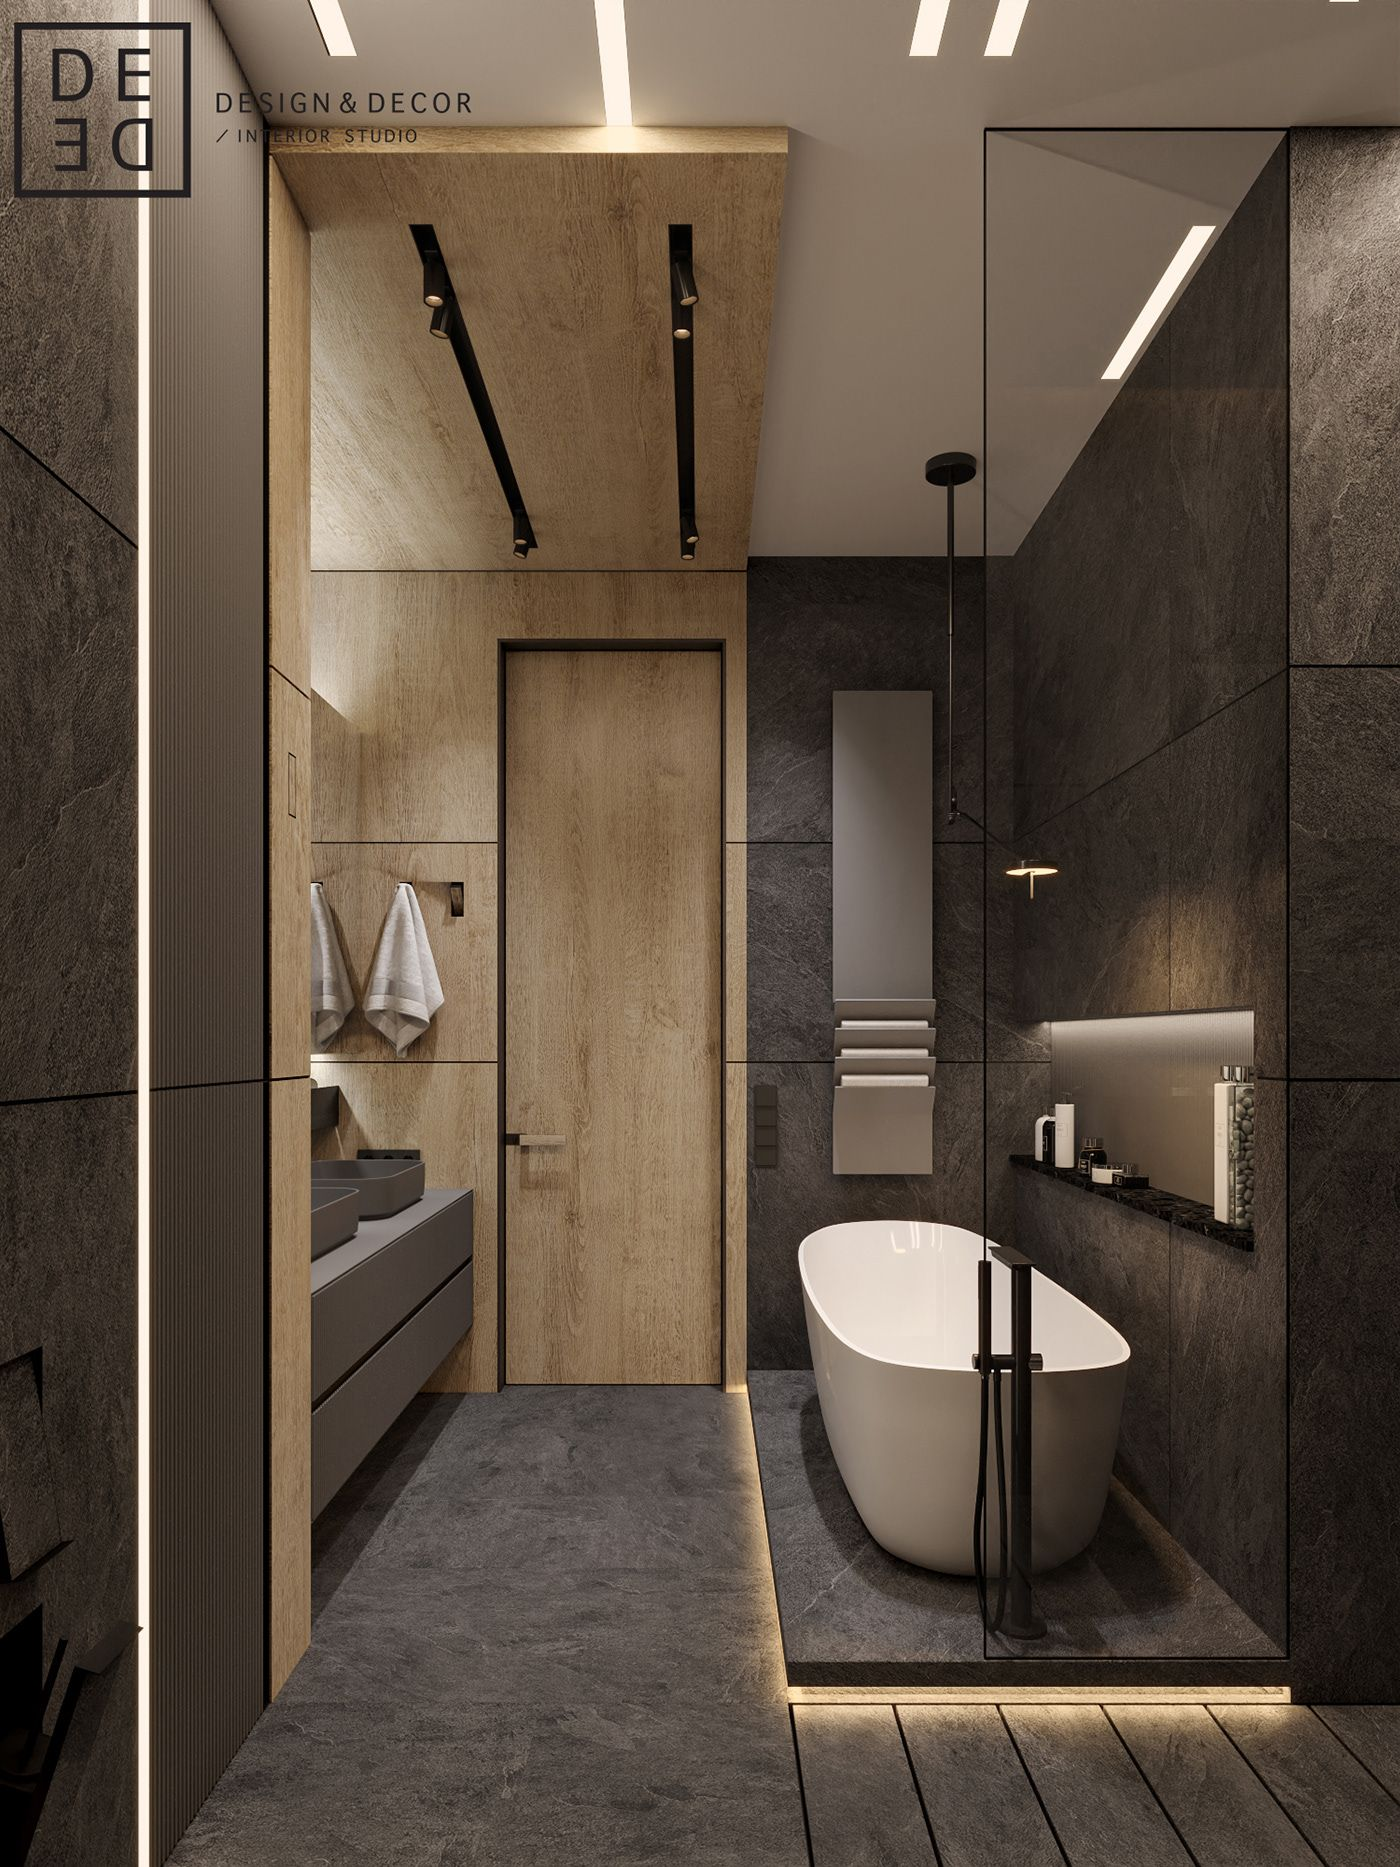 De De Studio On Behance Bathroom Interior Design Bathroom Design Toilet Design